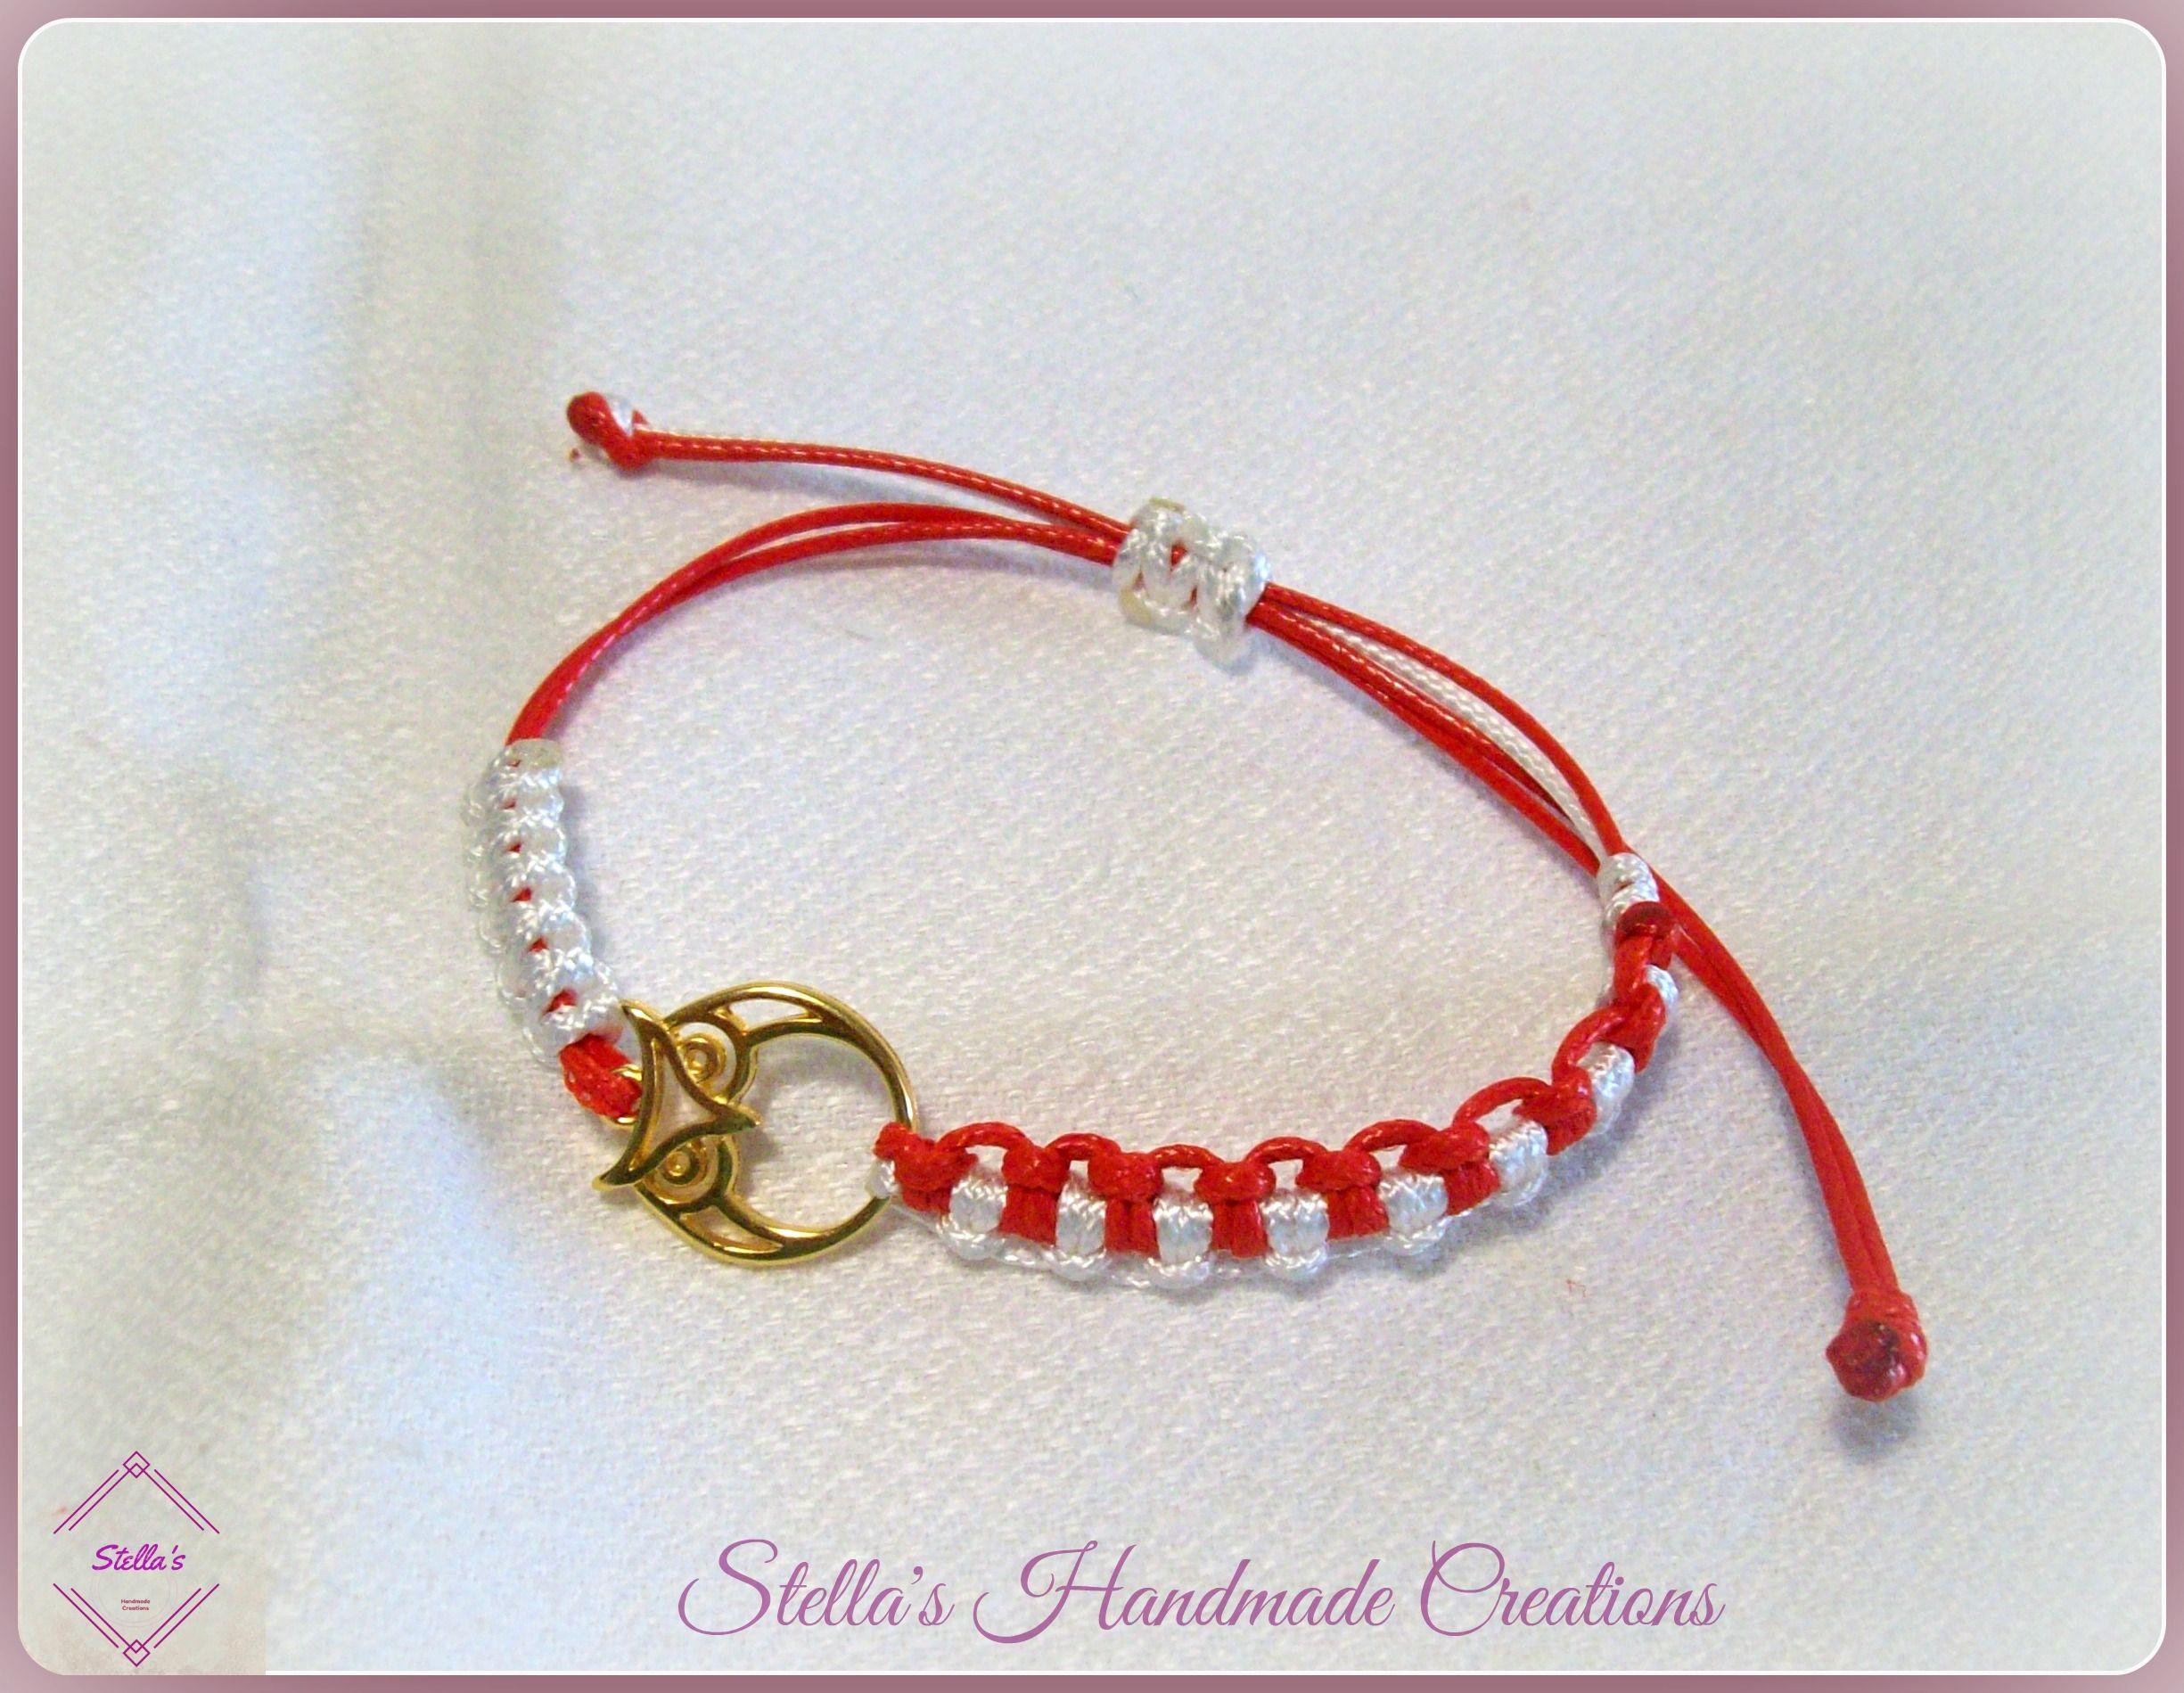 March macrame bracelet with owl Βραχιόλι μάρτης μακραμέ με κουκουβάγια dddda9e5204